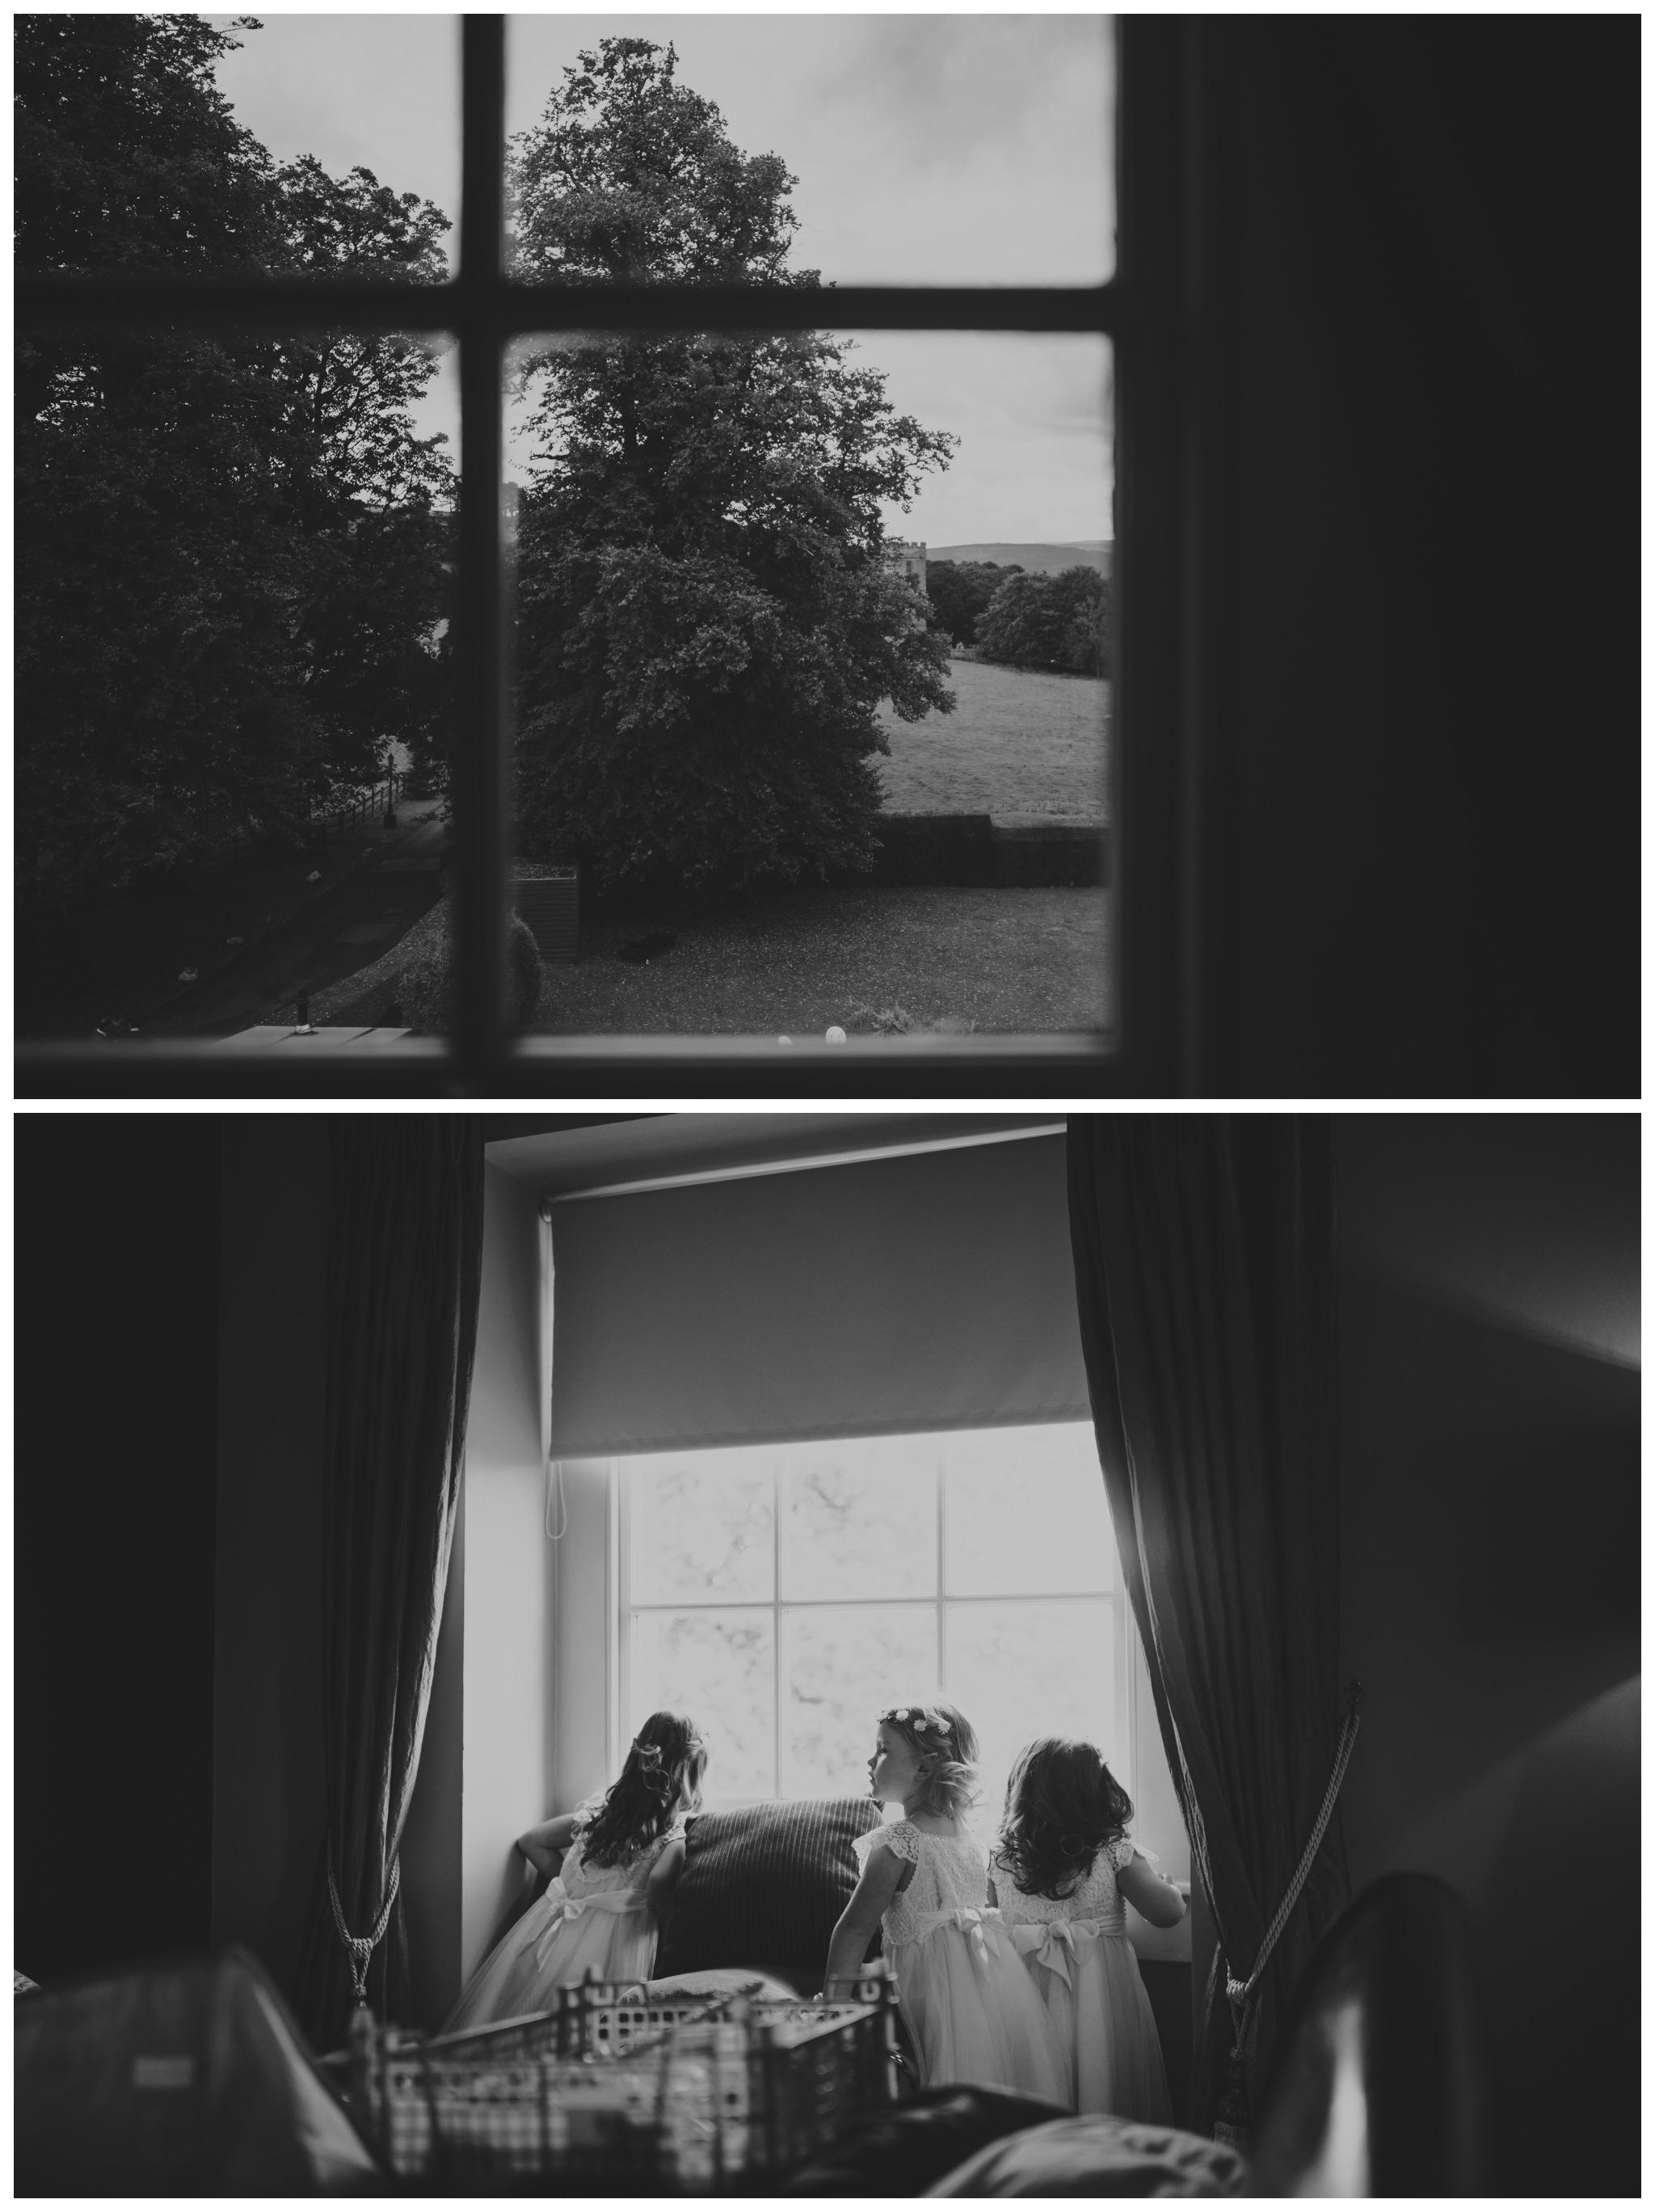 Richard Savage Photography - Wedding - Peterstone Court Brecon - 2016-05-11_0015